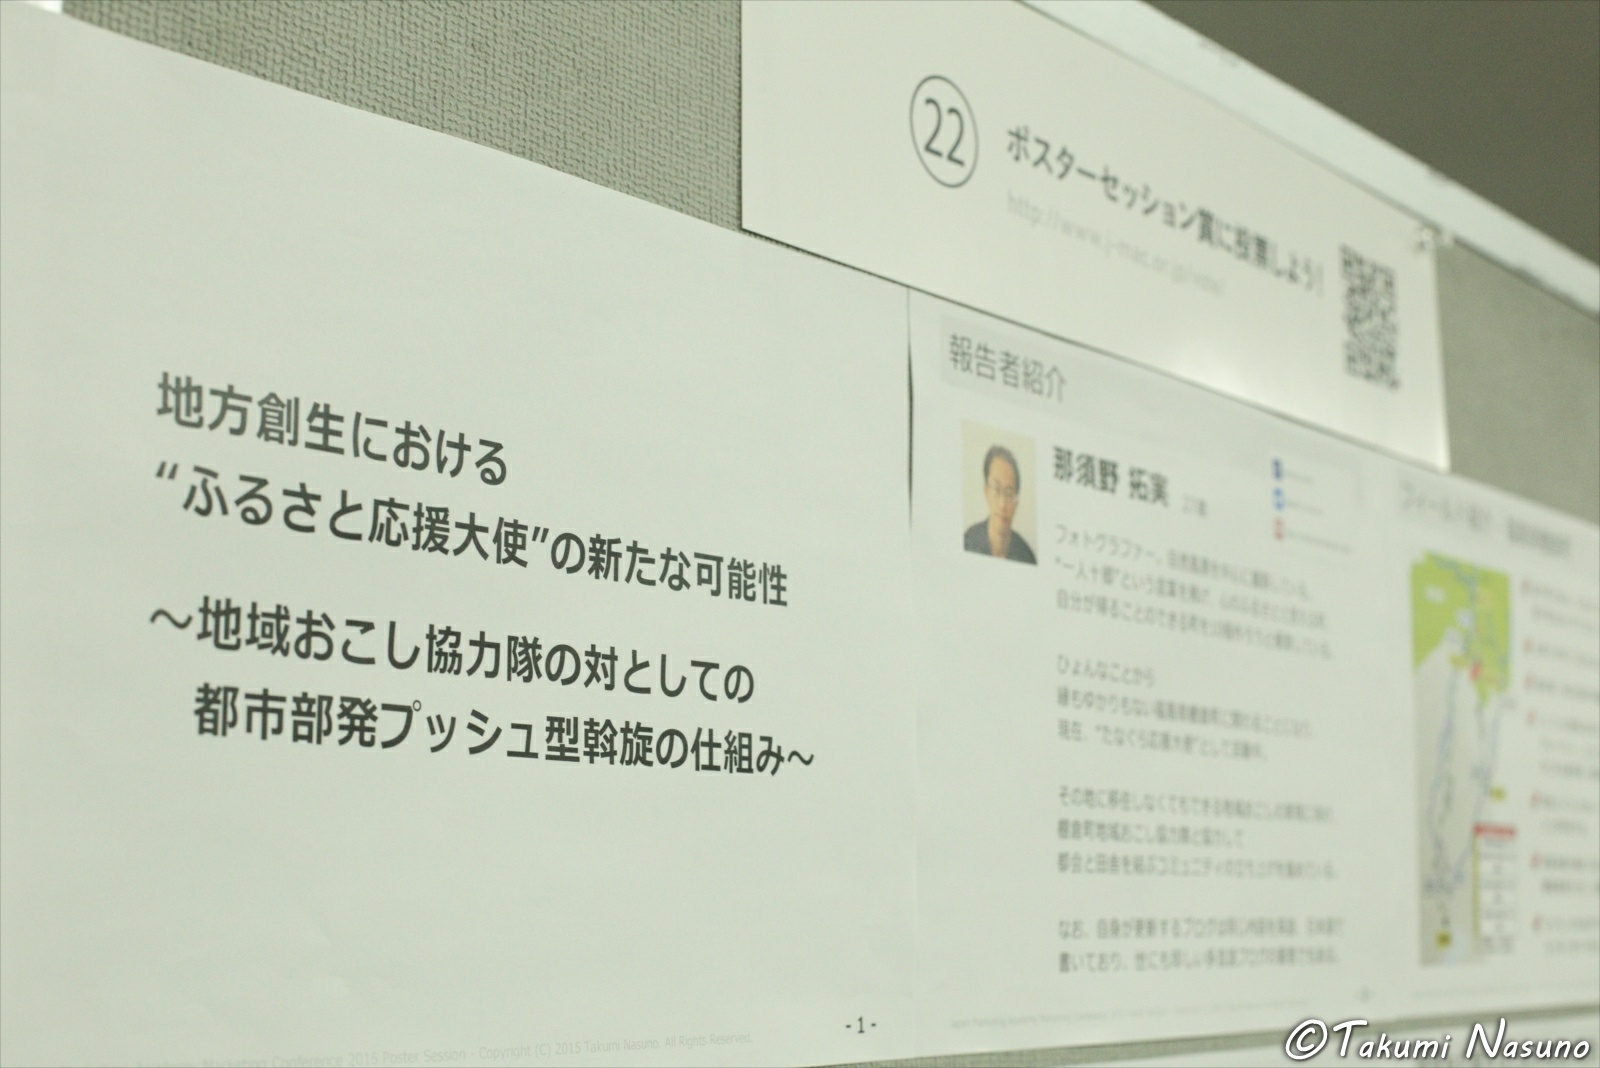 Left Side of the Poster for Japan Marketing Association Conference 2015